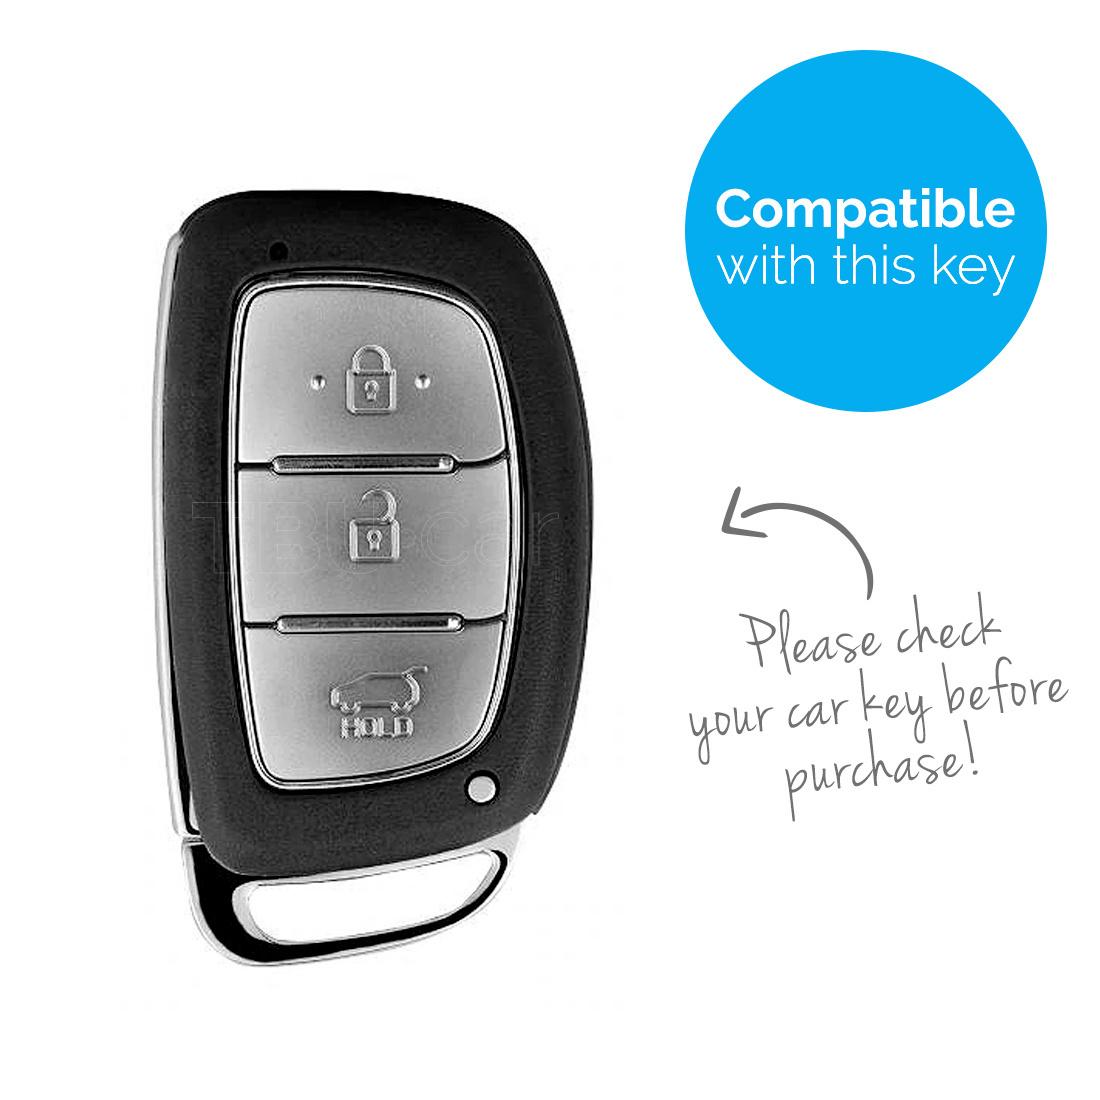 TBU car TBU car Autoschlüssel Hülle kompatibel mit Hyundai 3 Tasten (Keyless Entry) - Schutzhülle aus Silikon - Auto Schlüsselhülle Cover in Weiß